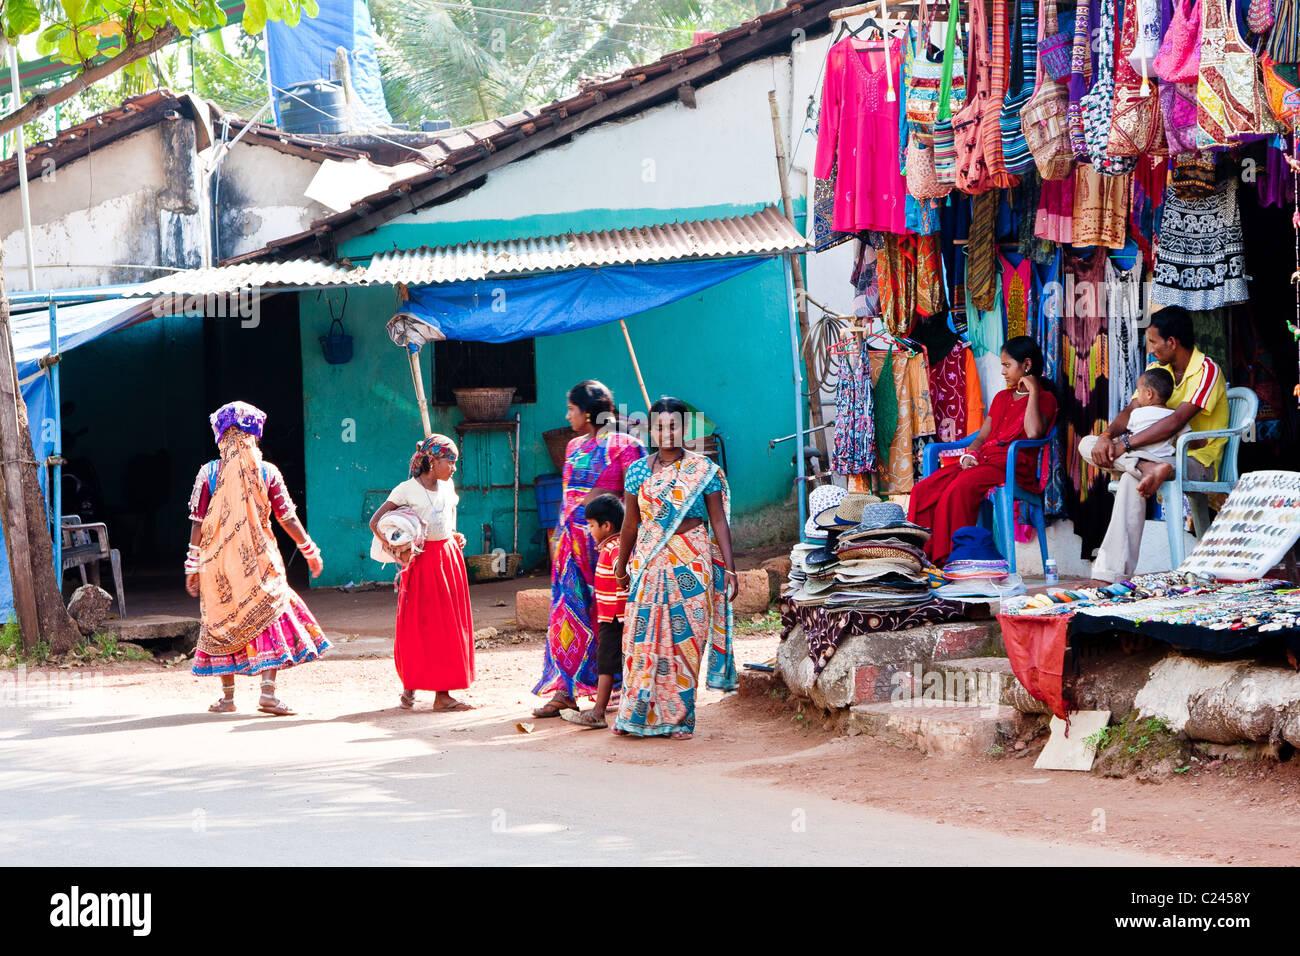 A street in Colva, Goa - Stock Image